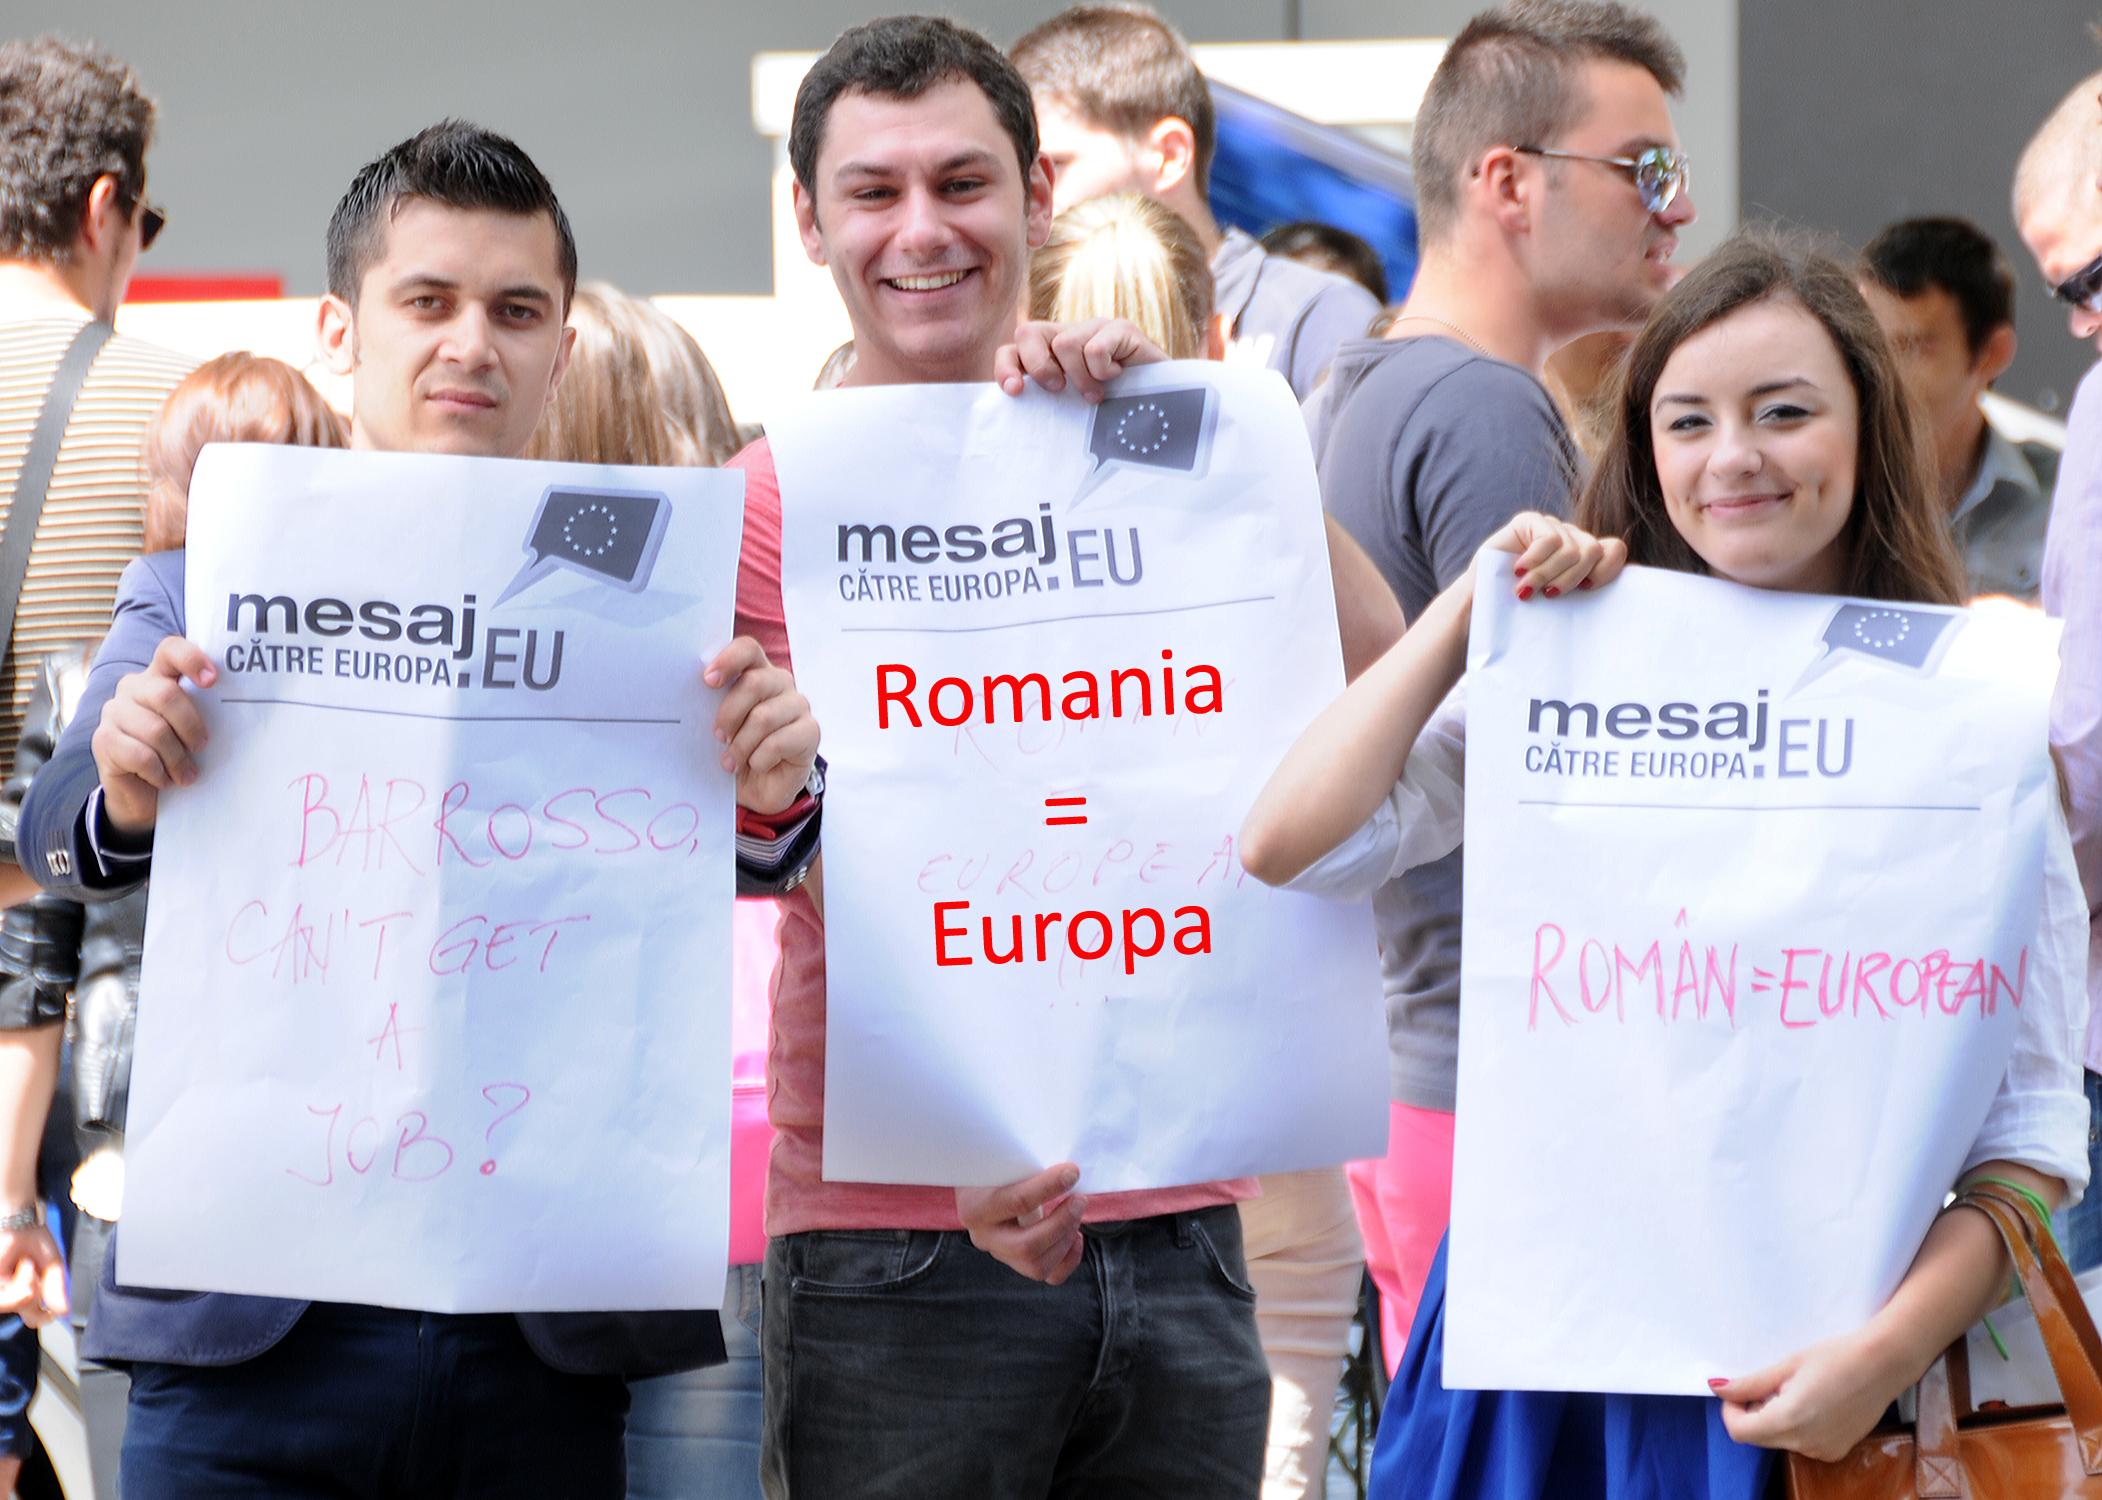 http://pes.ro/blog/wp-content/uploads/2013/05/PES-activists-Romania-1.jpg